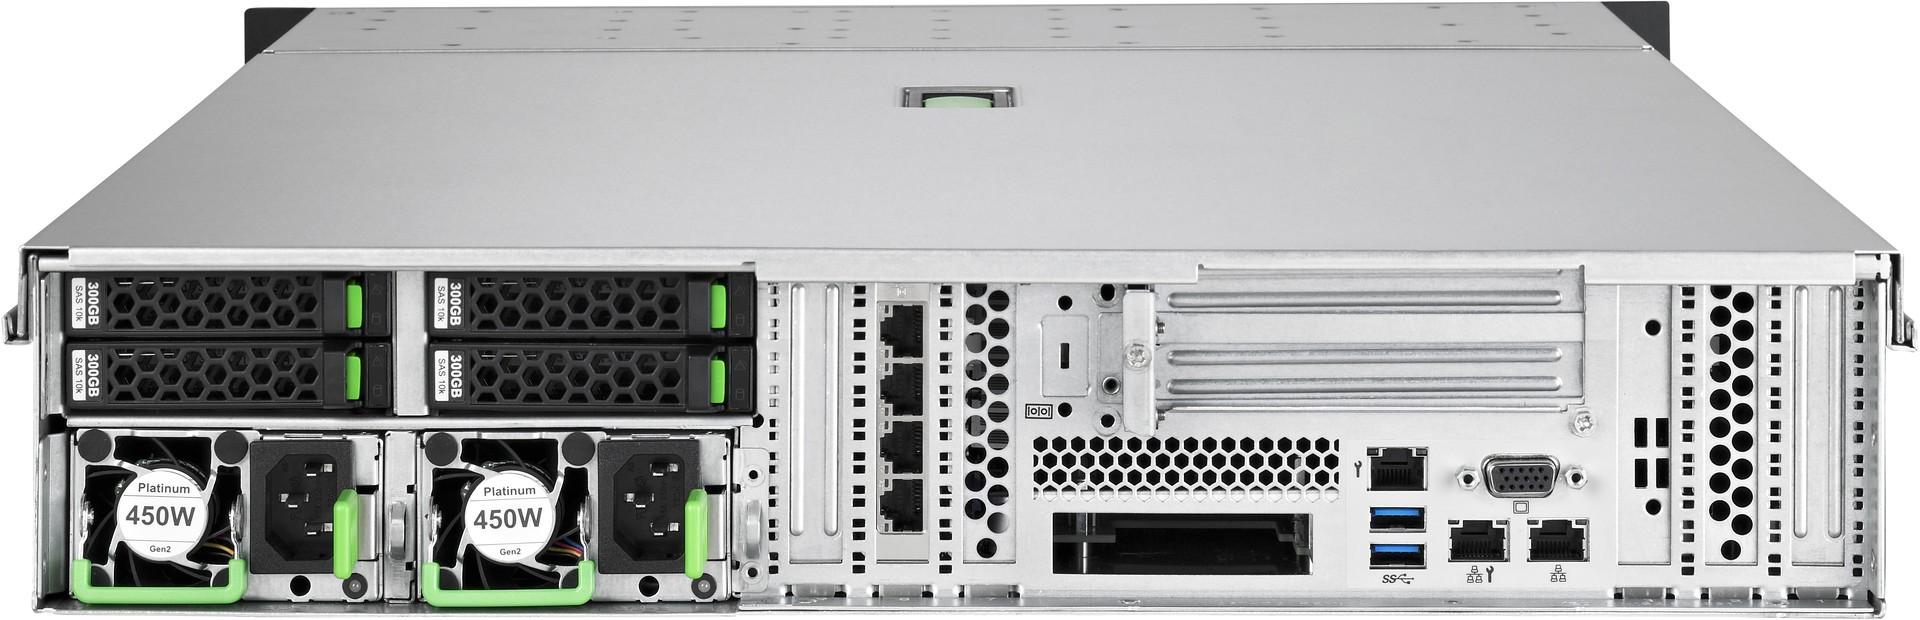 FUJITSU PRIMERGY Server RX2540 M4 Rear